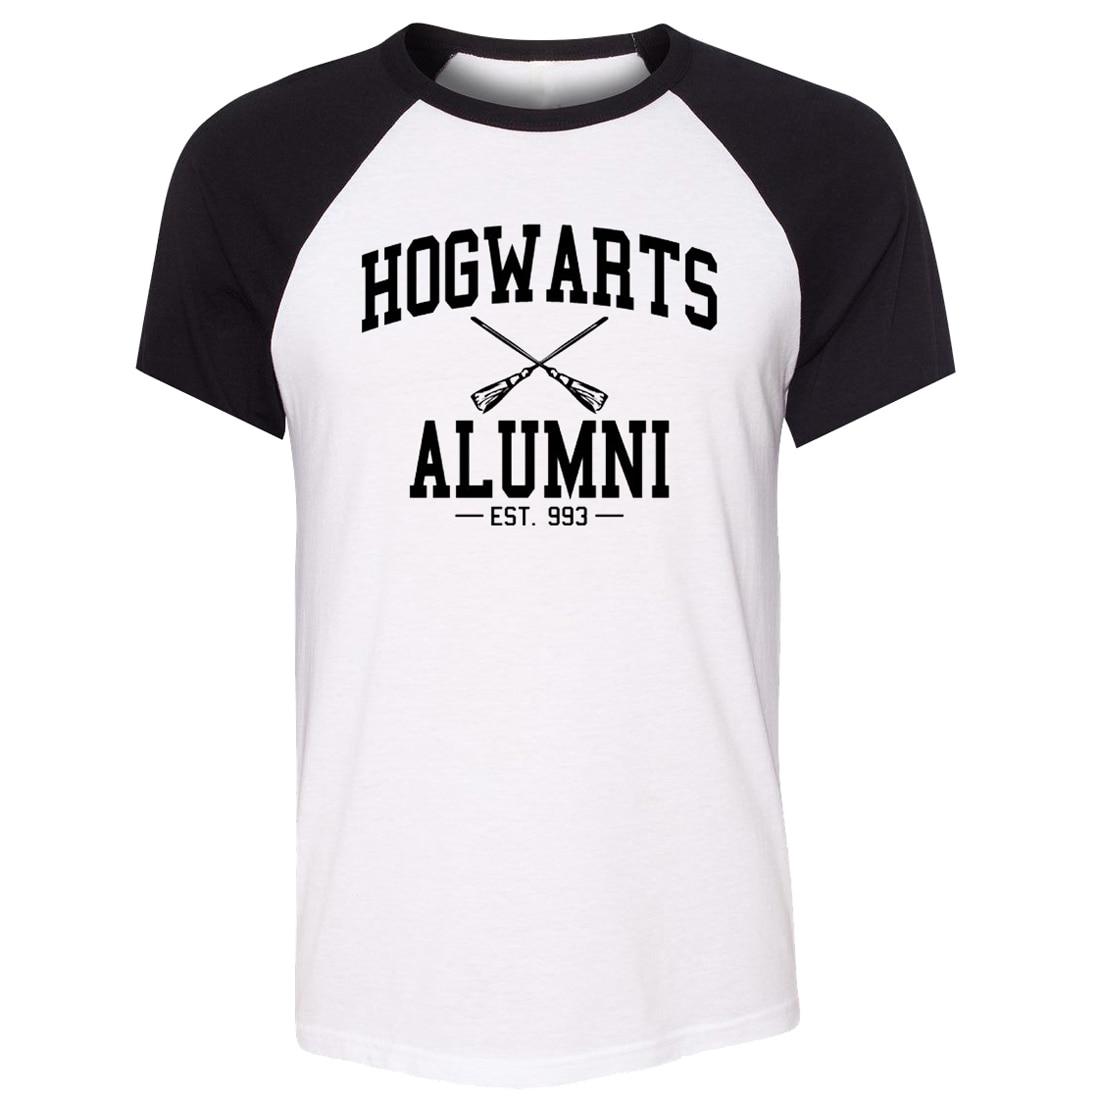 Desain t shirt raglan - Idzn Unisex Musim Panas T Shirt Hogwarts Alumni Est 993 Art Pola Desain Raglan